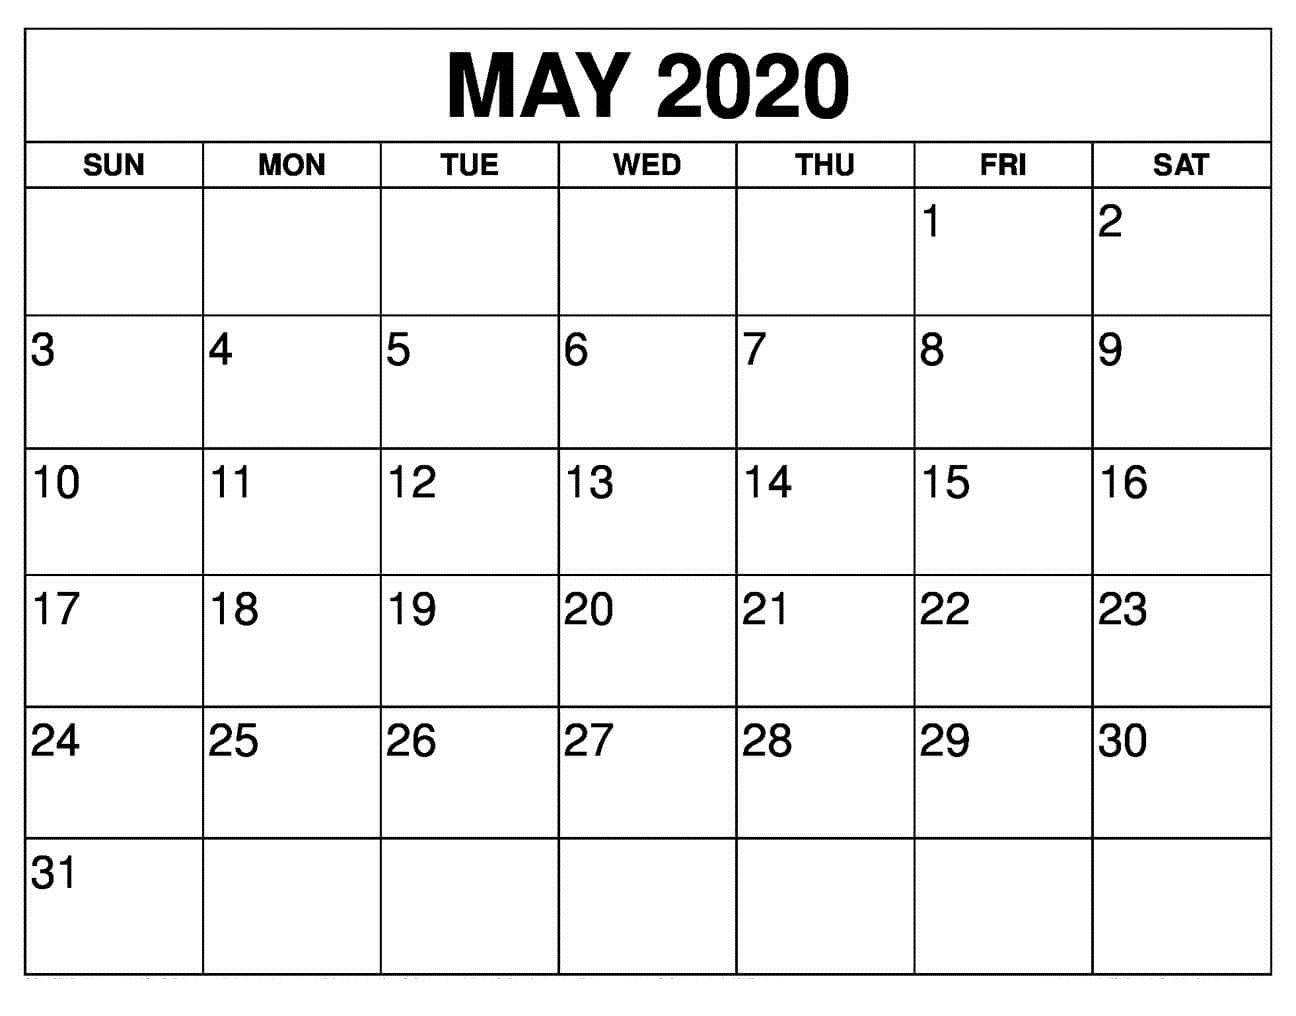 Free May 2020 Calendar Wallpaper